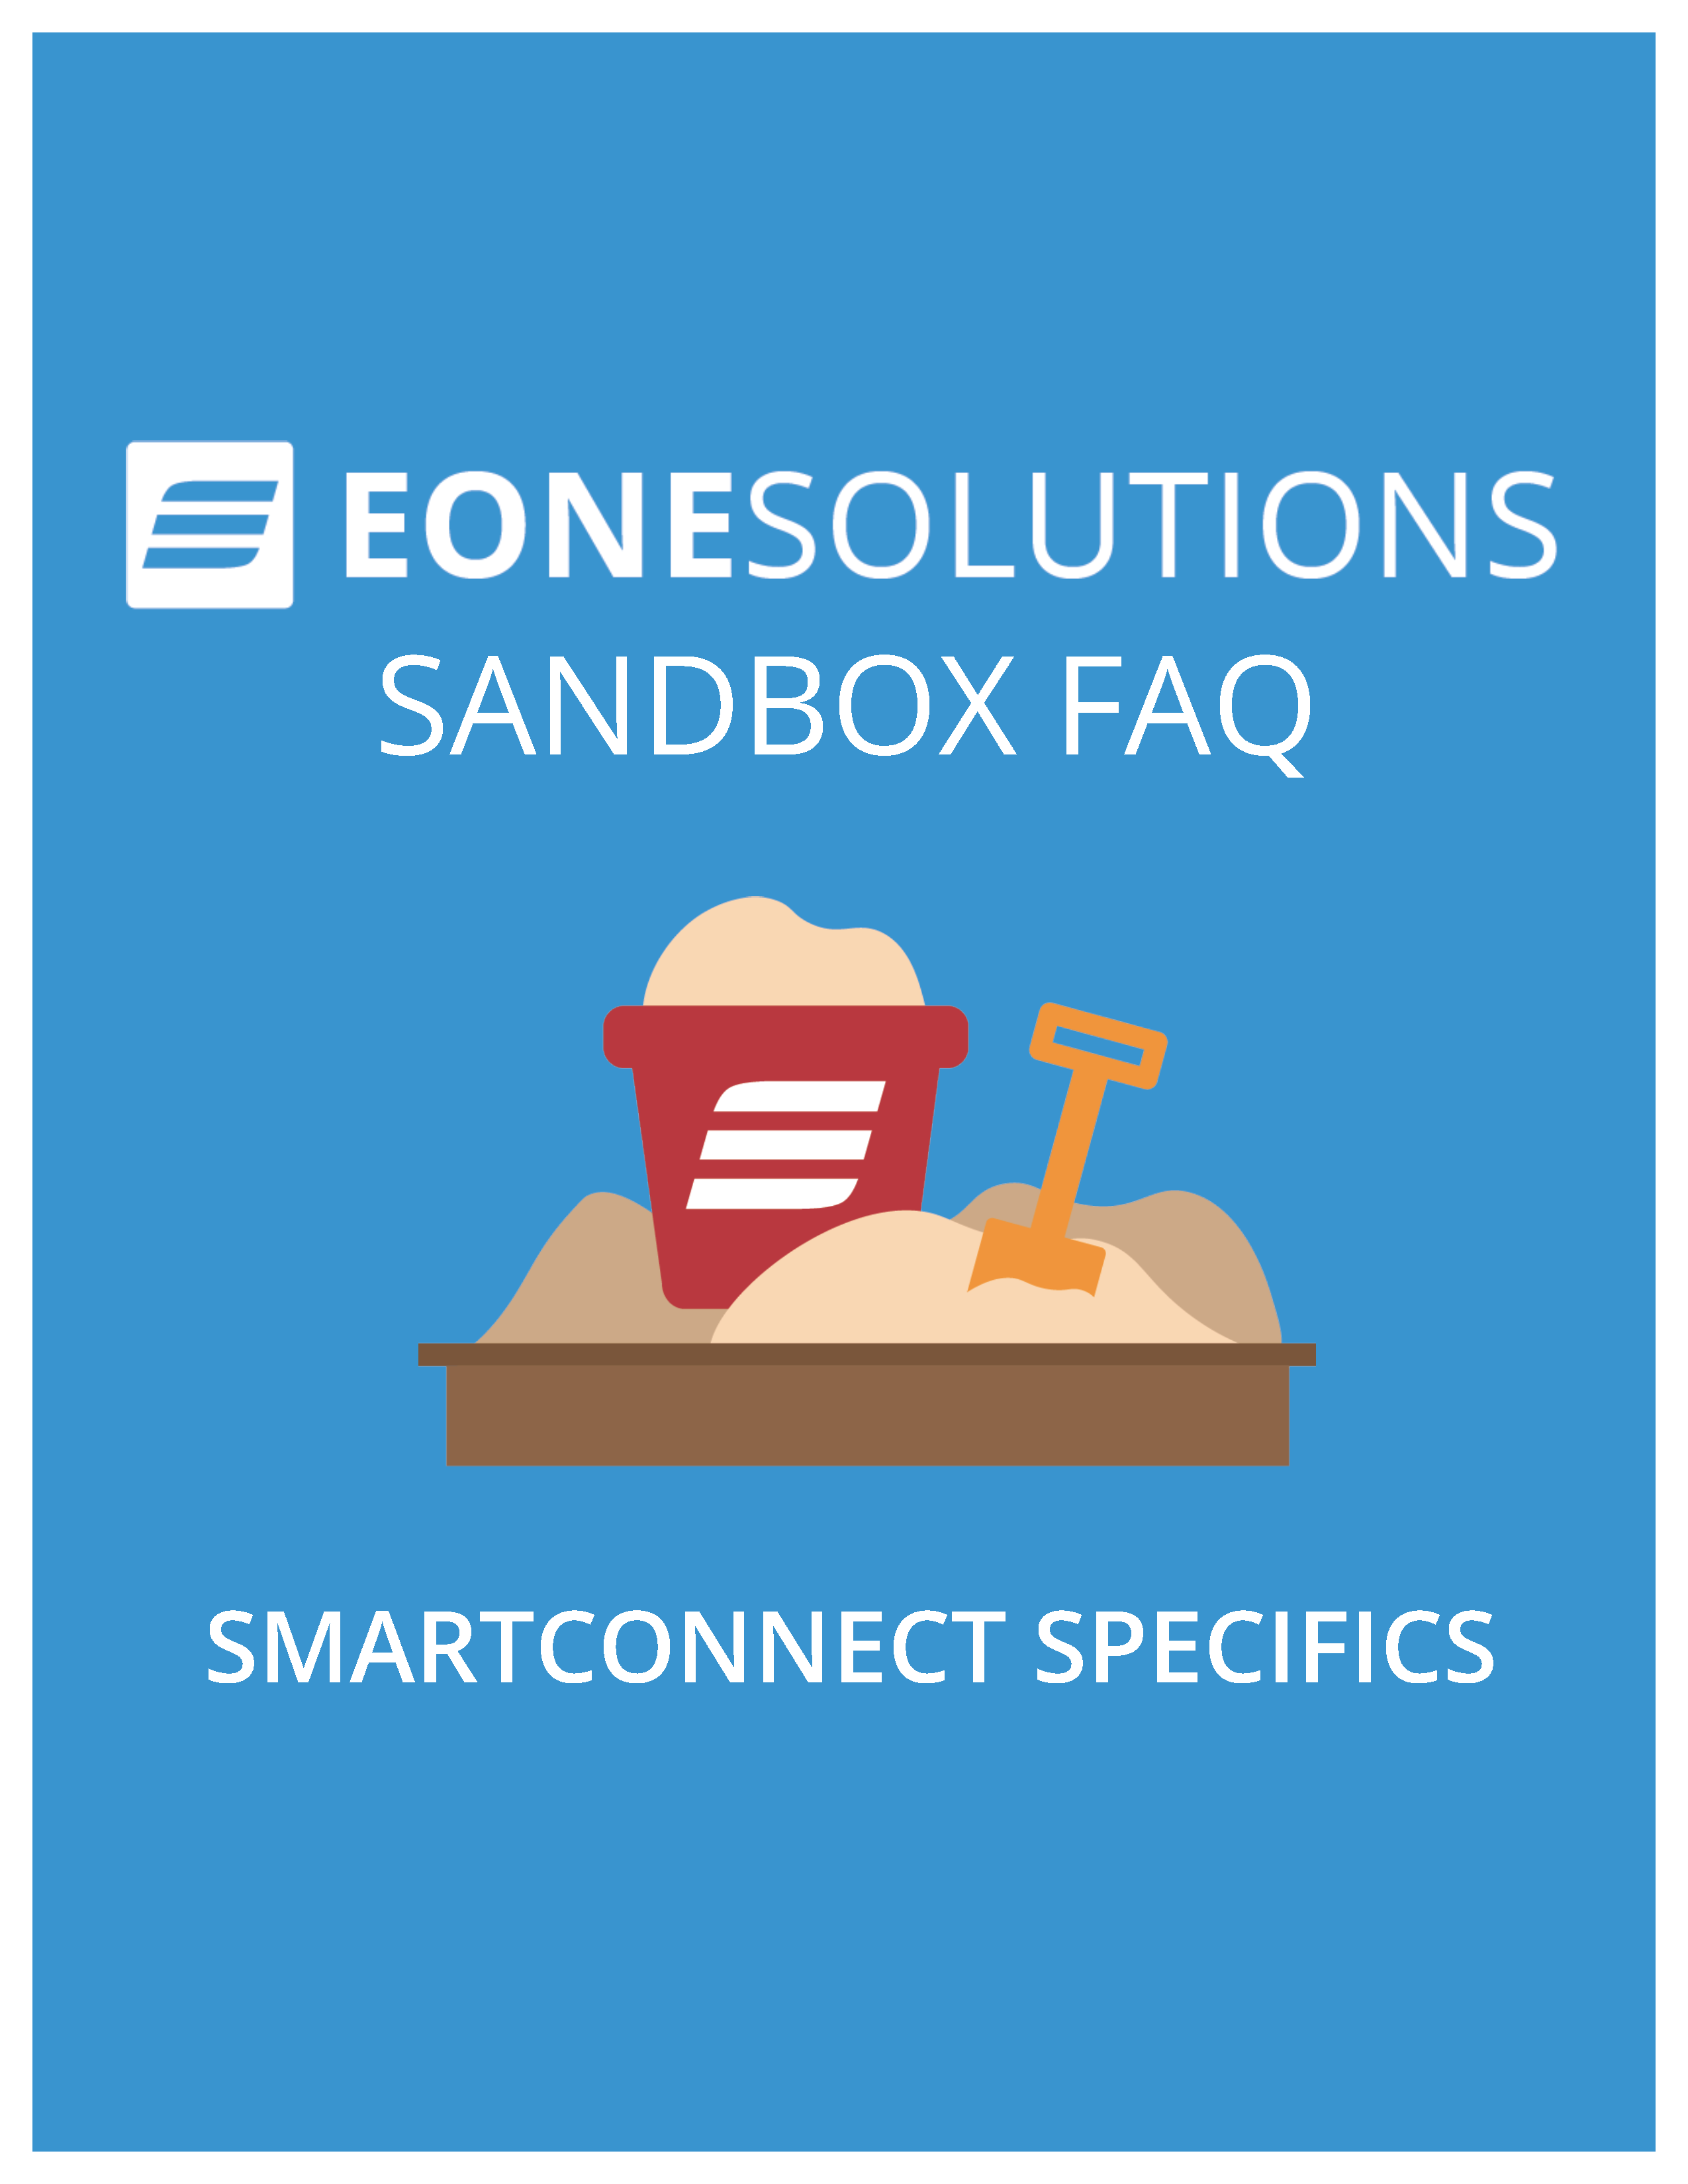 eOne Solutions Sandbox FAQ - SmartConnect Specifics